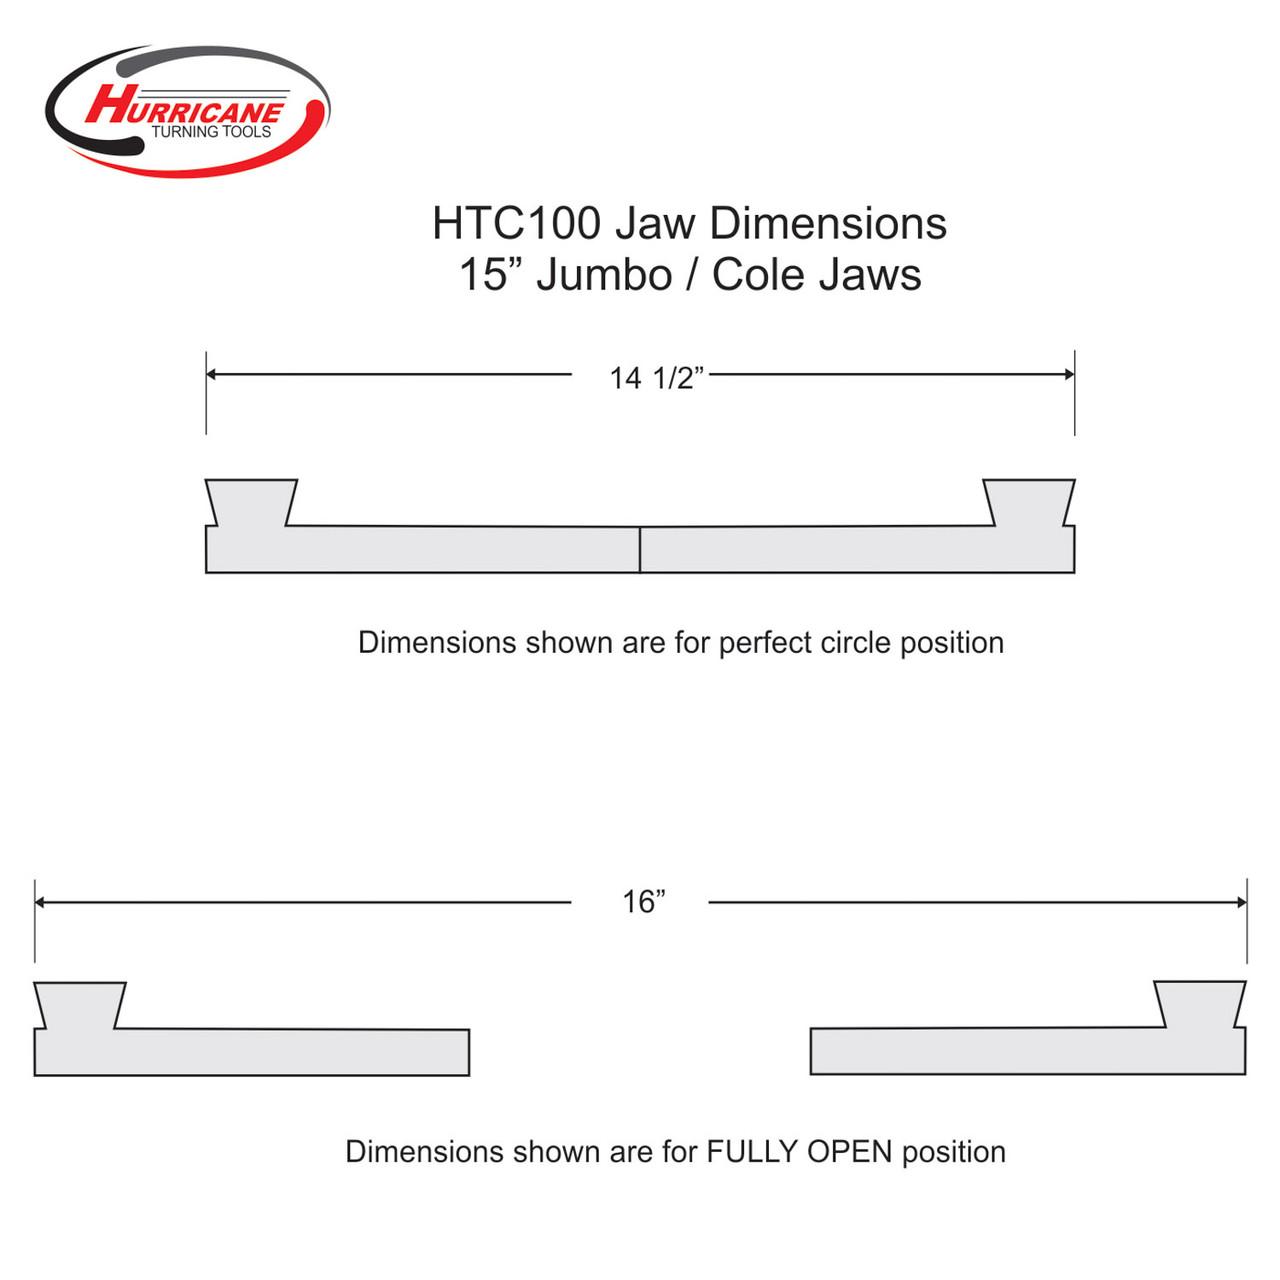 "Hurricane 15"" Convertible Jumbo / Cole Chuck Jaw Kit for the HTC100 Chuck"